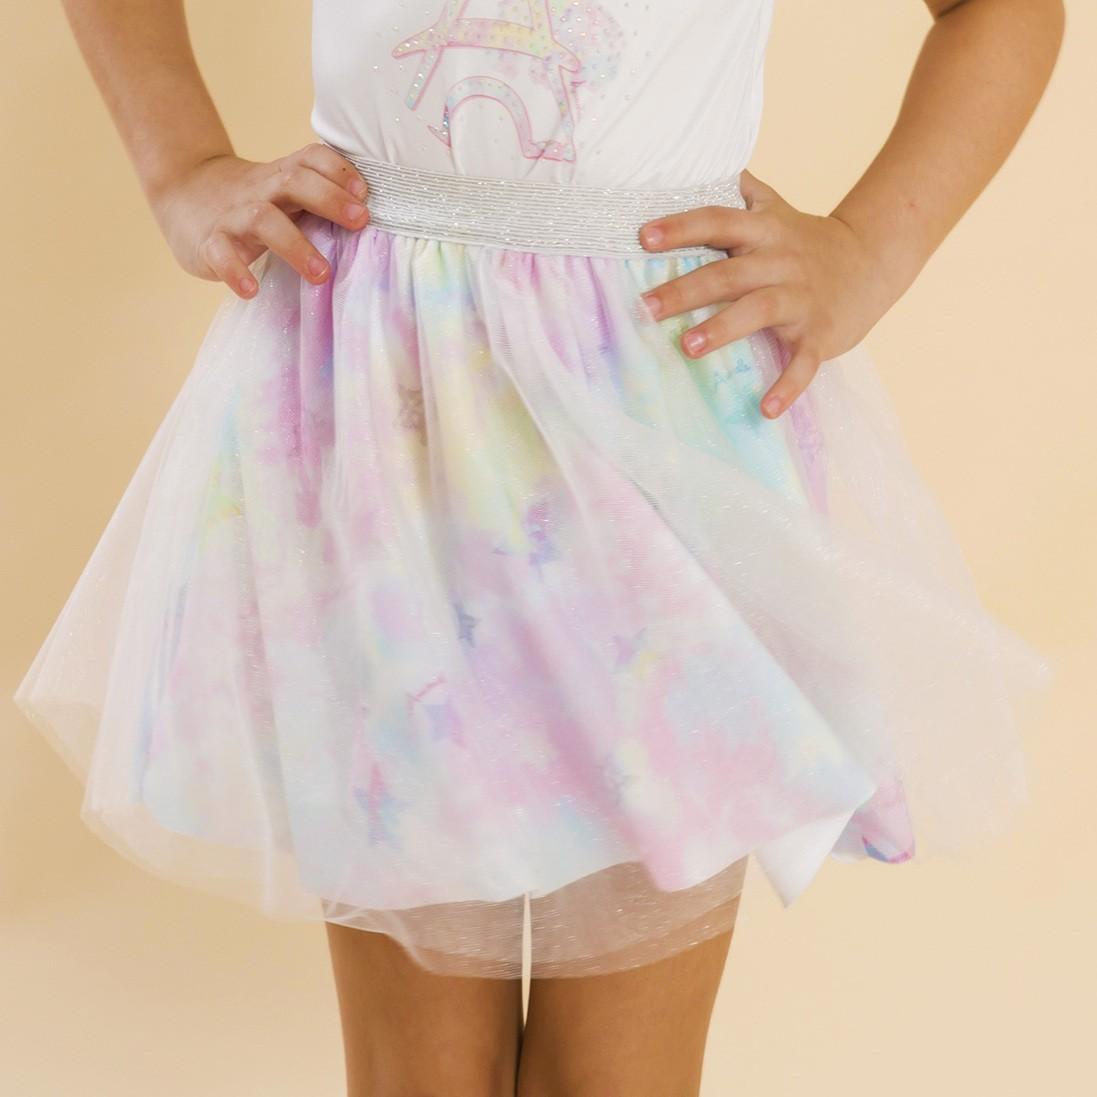 Saia Infantil Bailarina Tie Dye Rosa